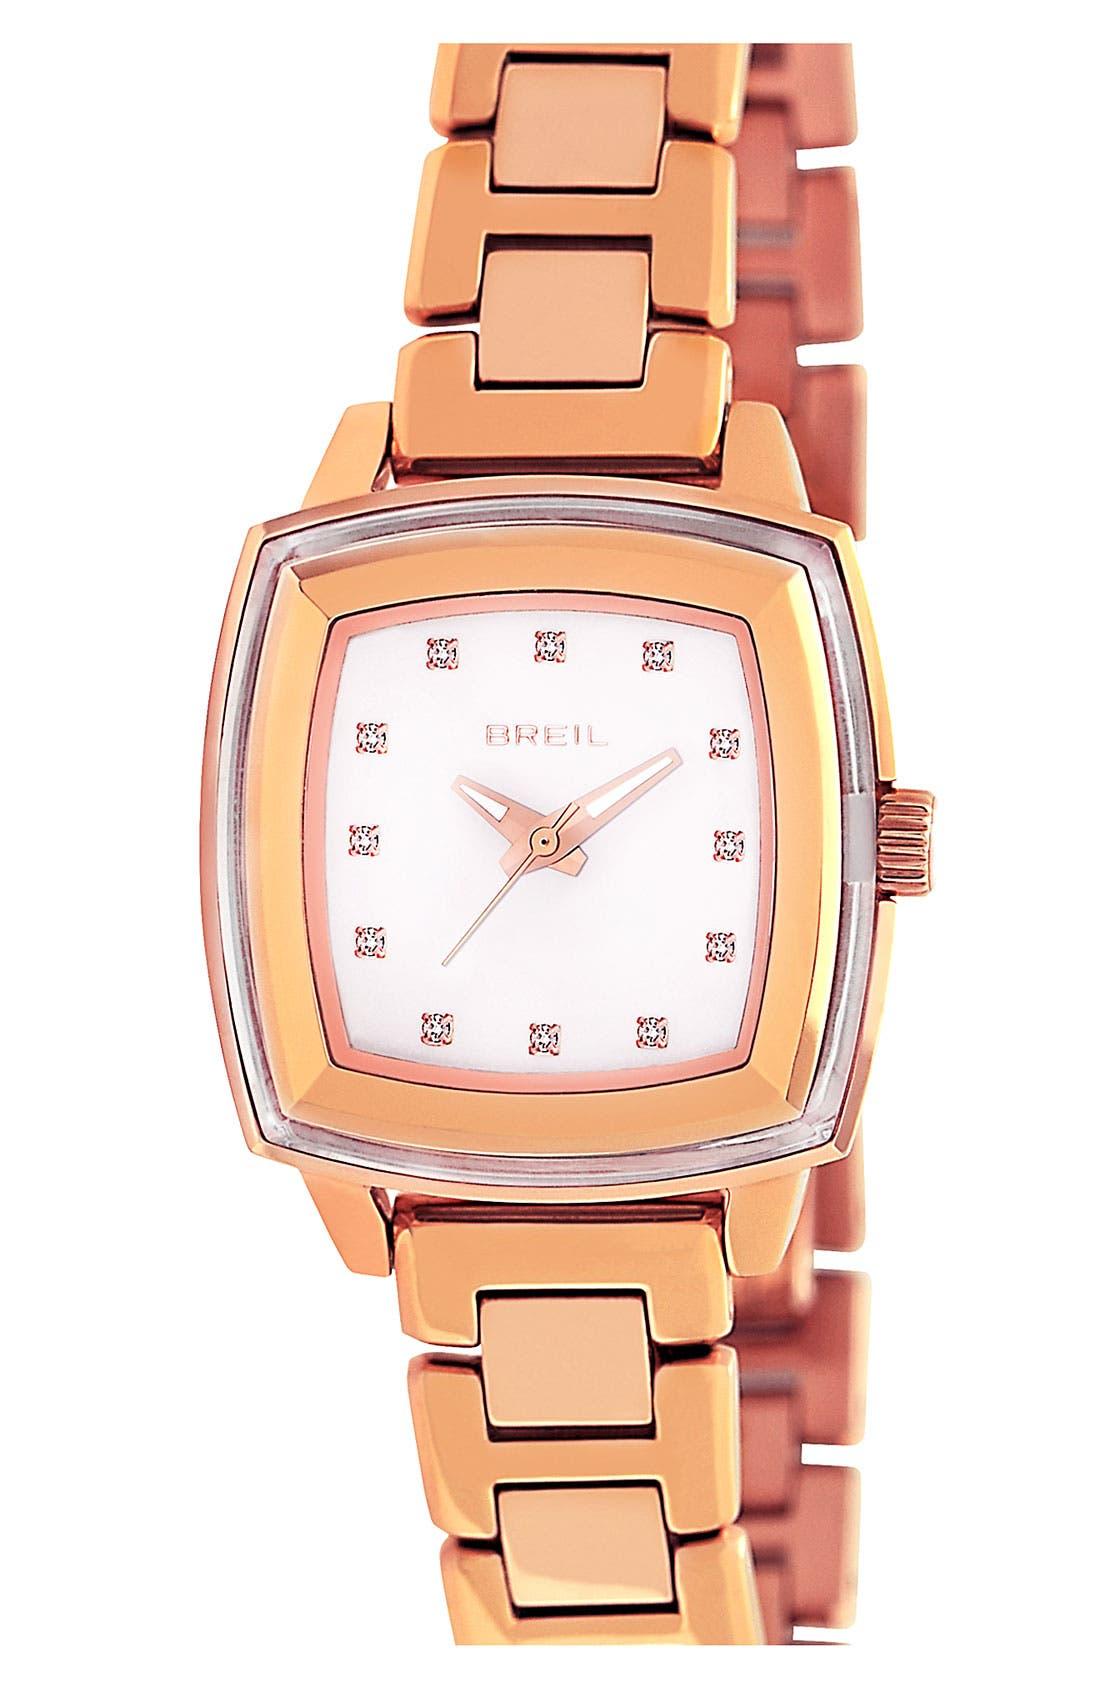 Alternate Image 1 Selected - Breil 'Orchestra' Square Case Bracelet Watch, 29mm x 36mm